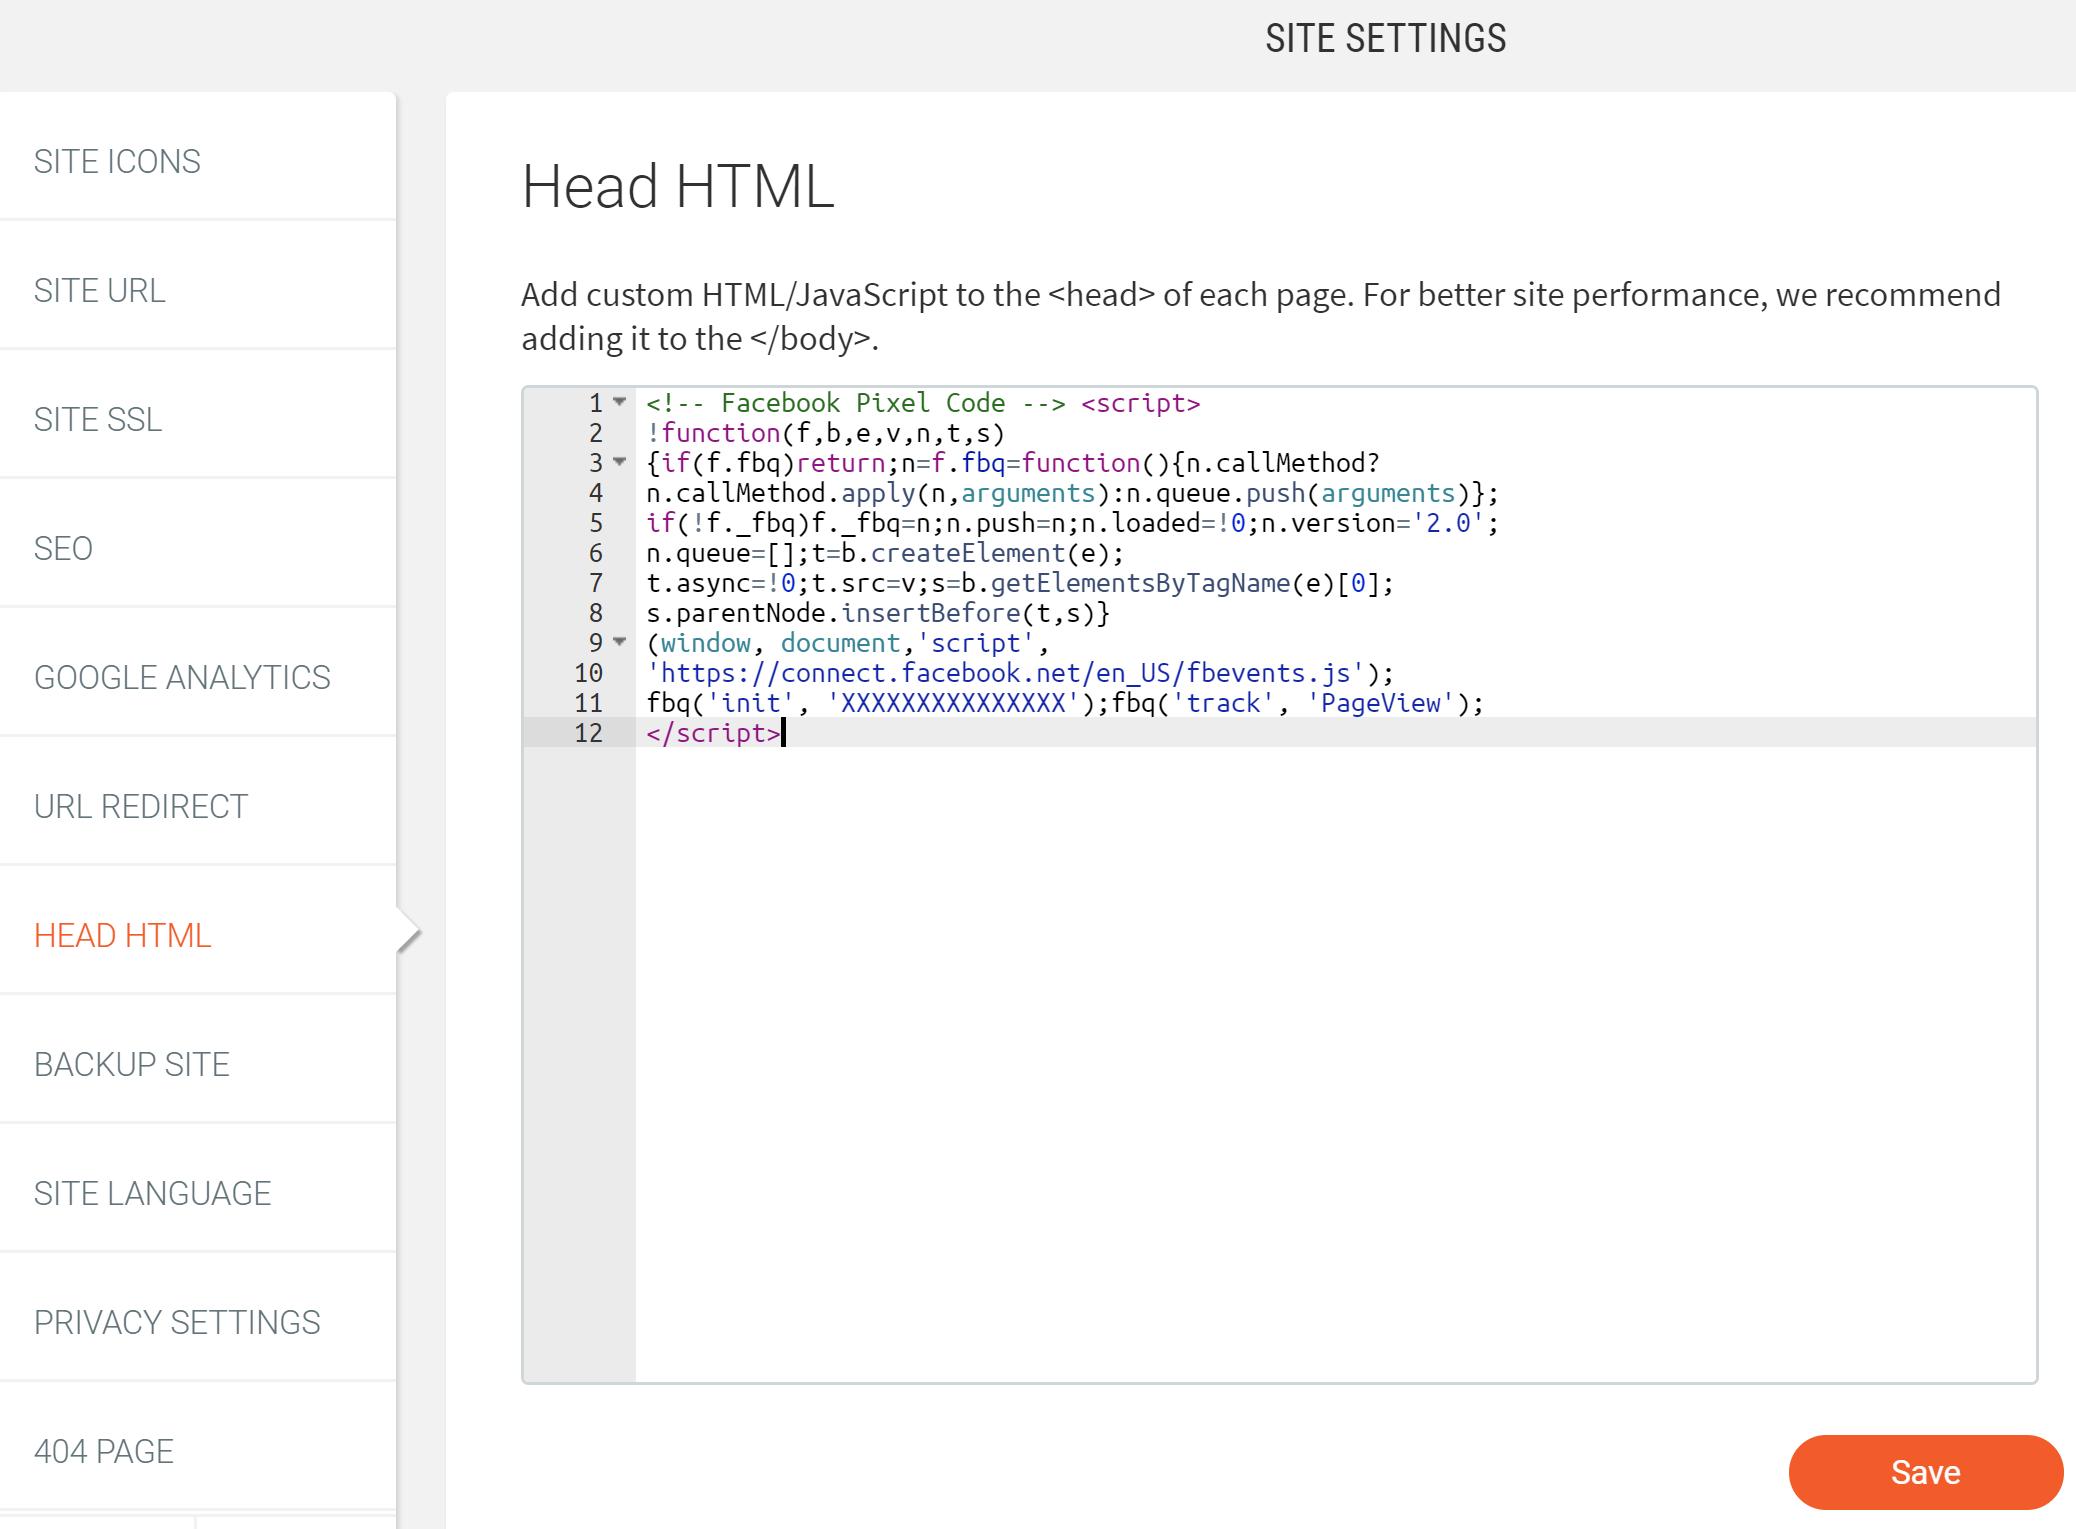 Paramètres d'En-tête HTML